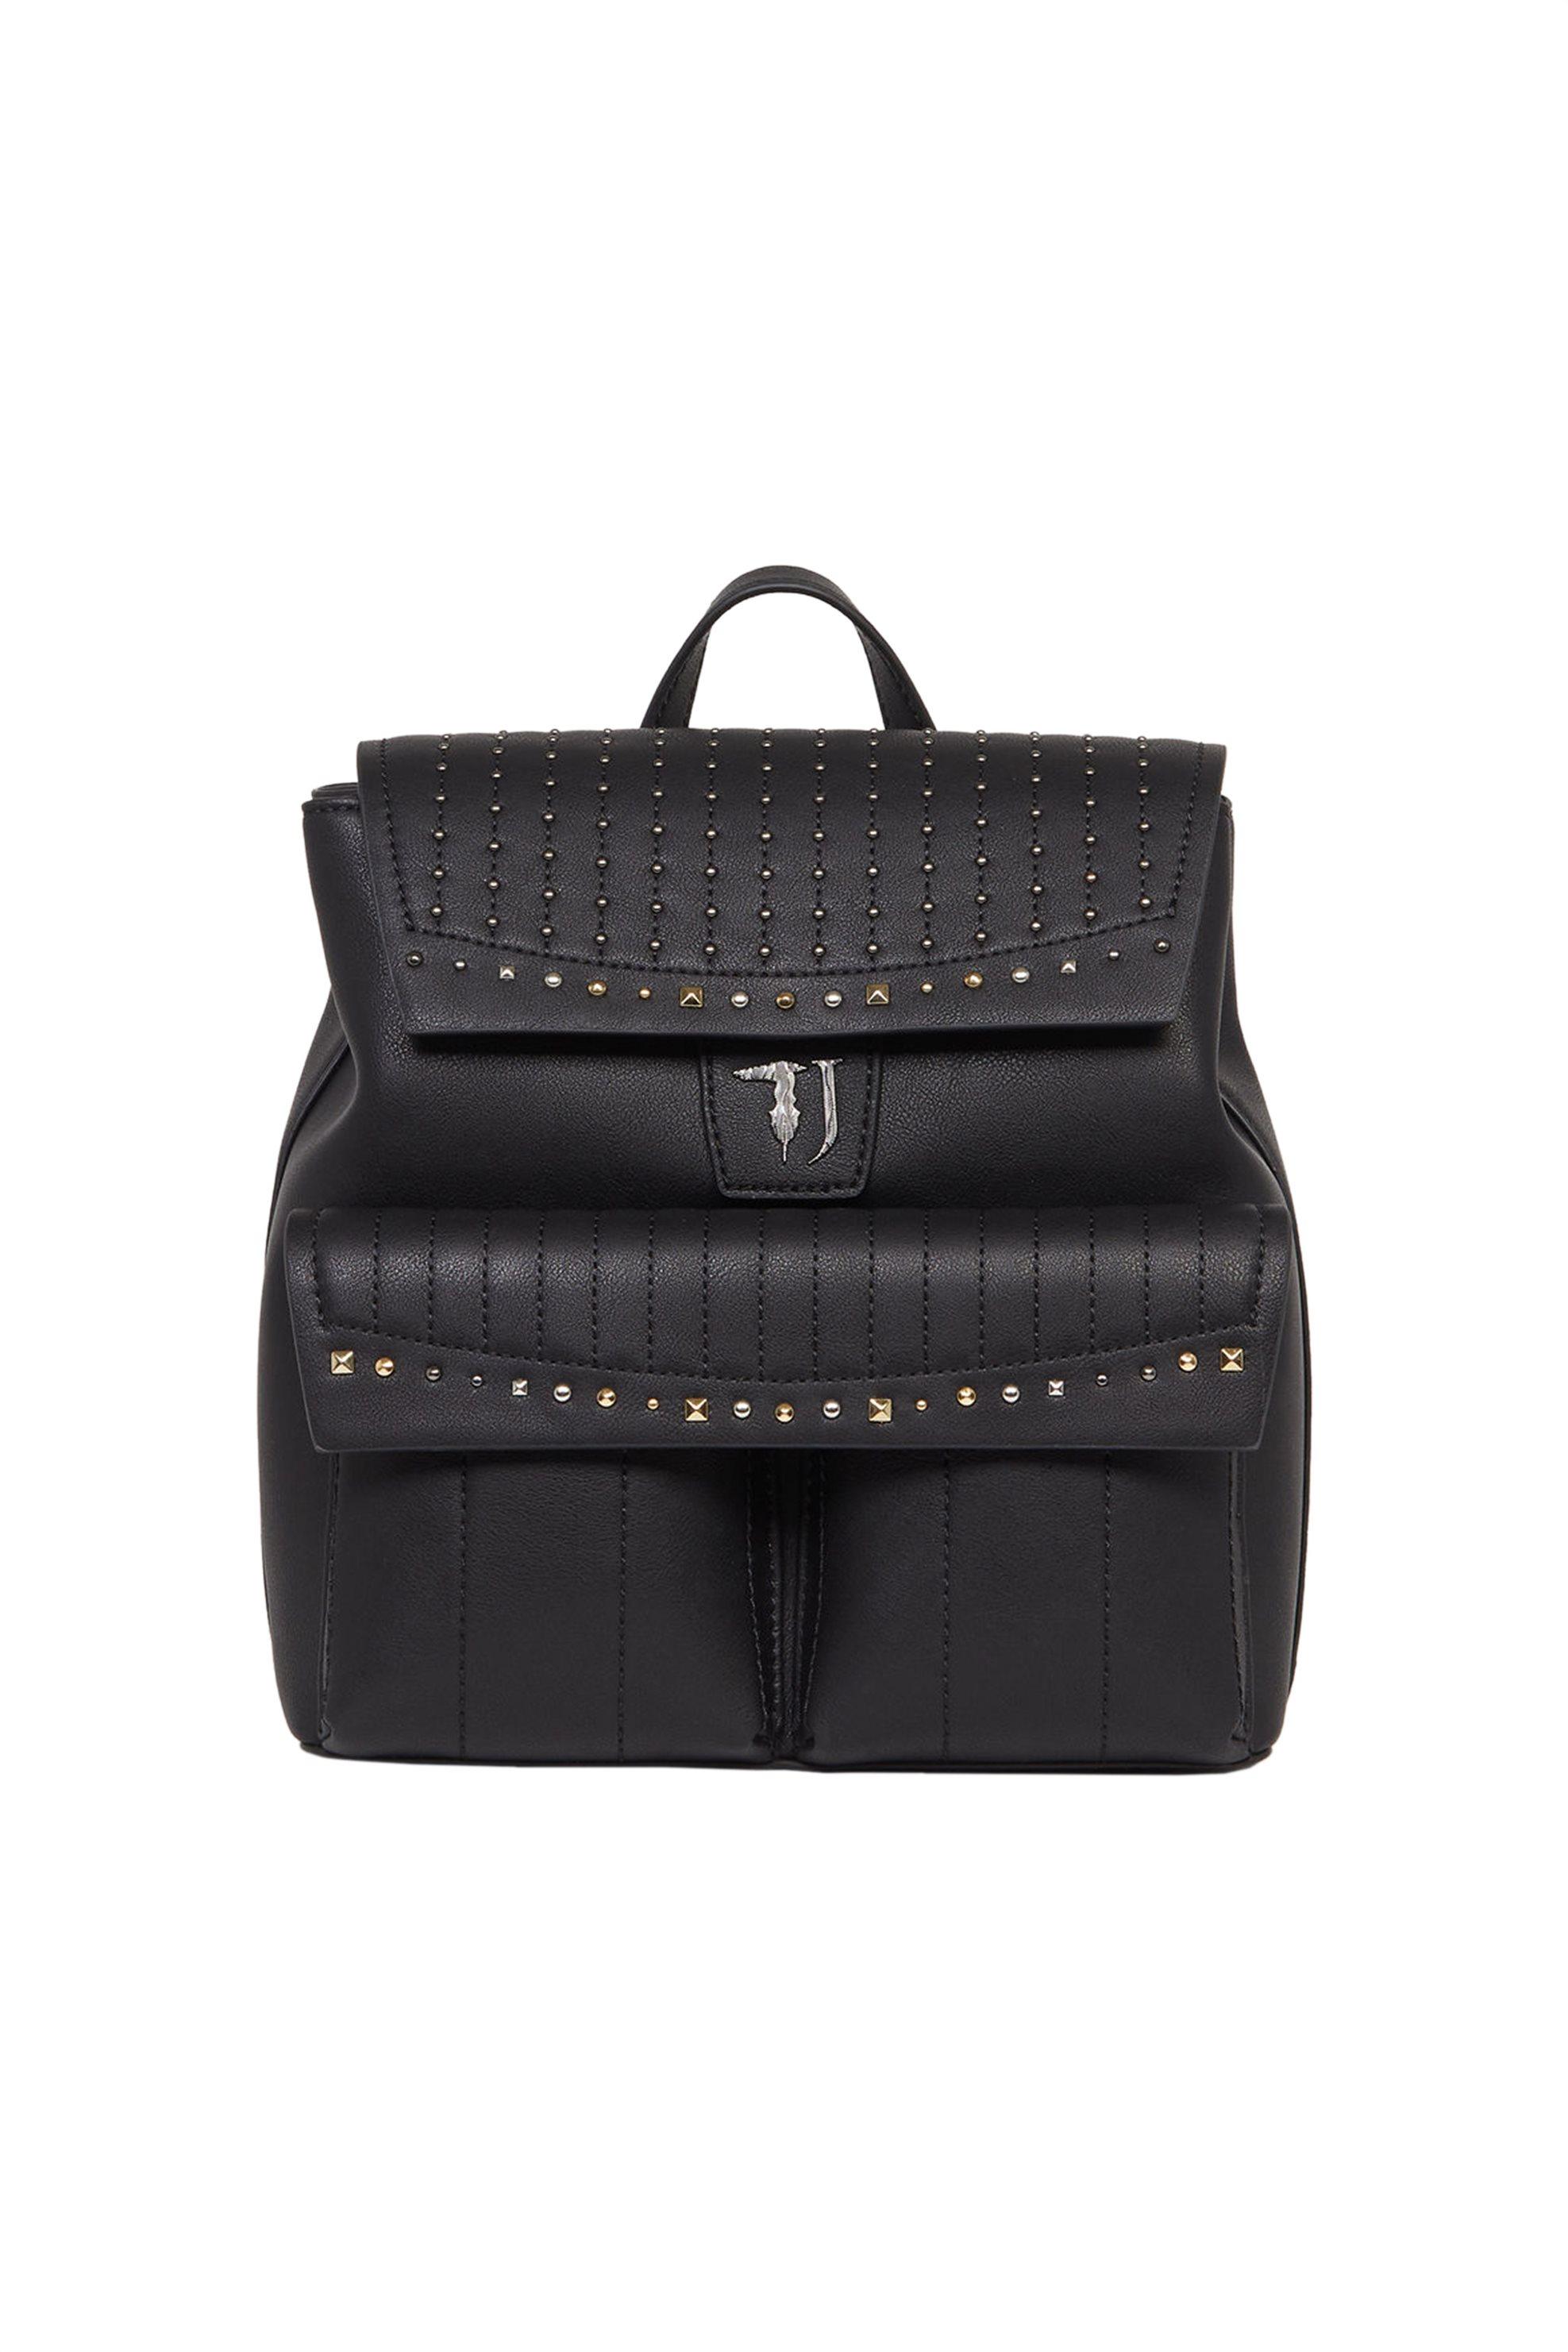 Trussardi Jeans γυναικείο backpack Curcuma - 75B00508-9Y099999 - Μαύρο γυναικα   τσαντεσ   σακίδια   backpacks